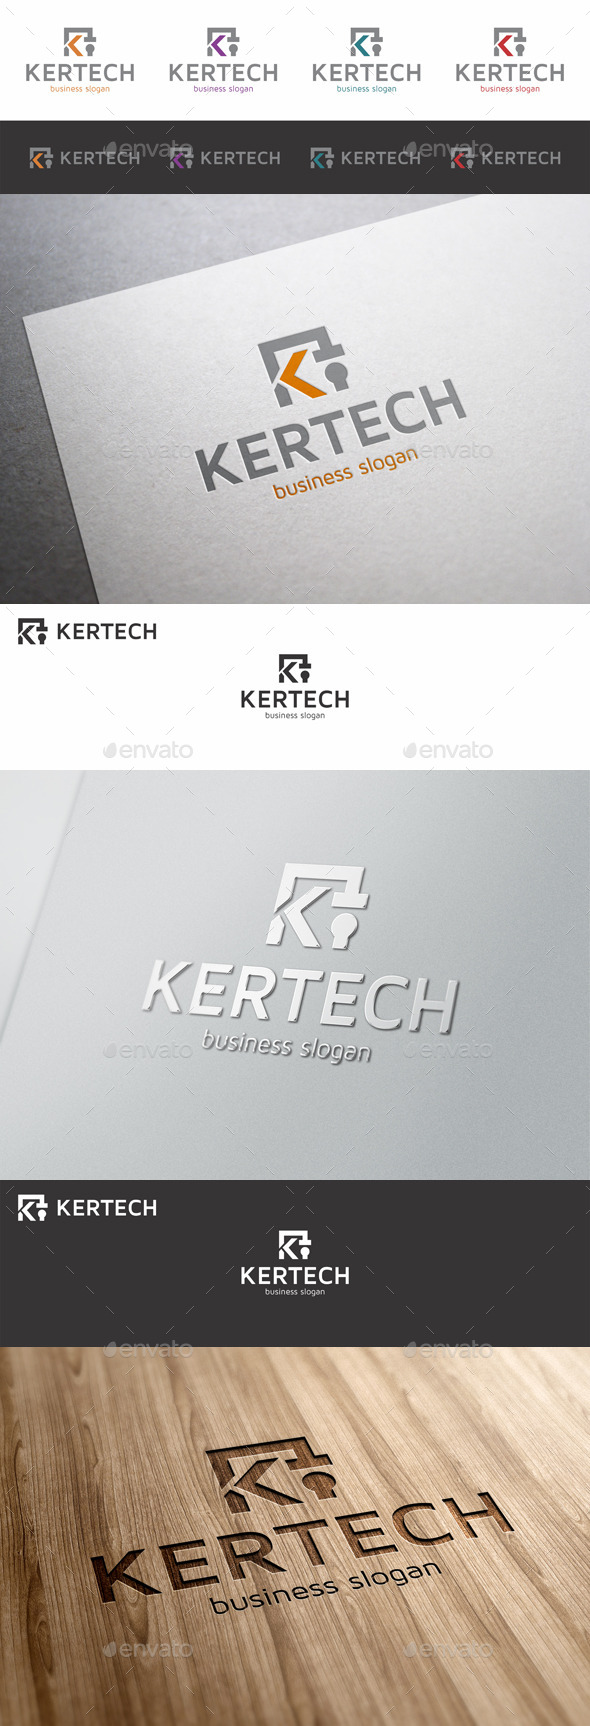 K Letter Logo Template - Kertech